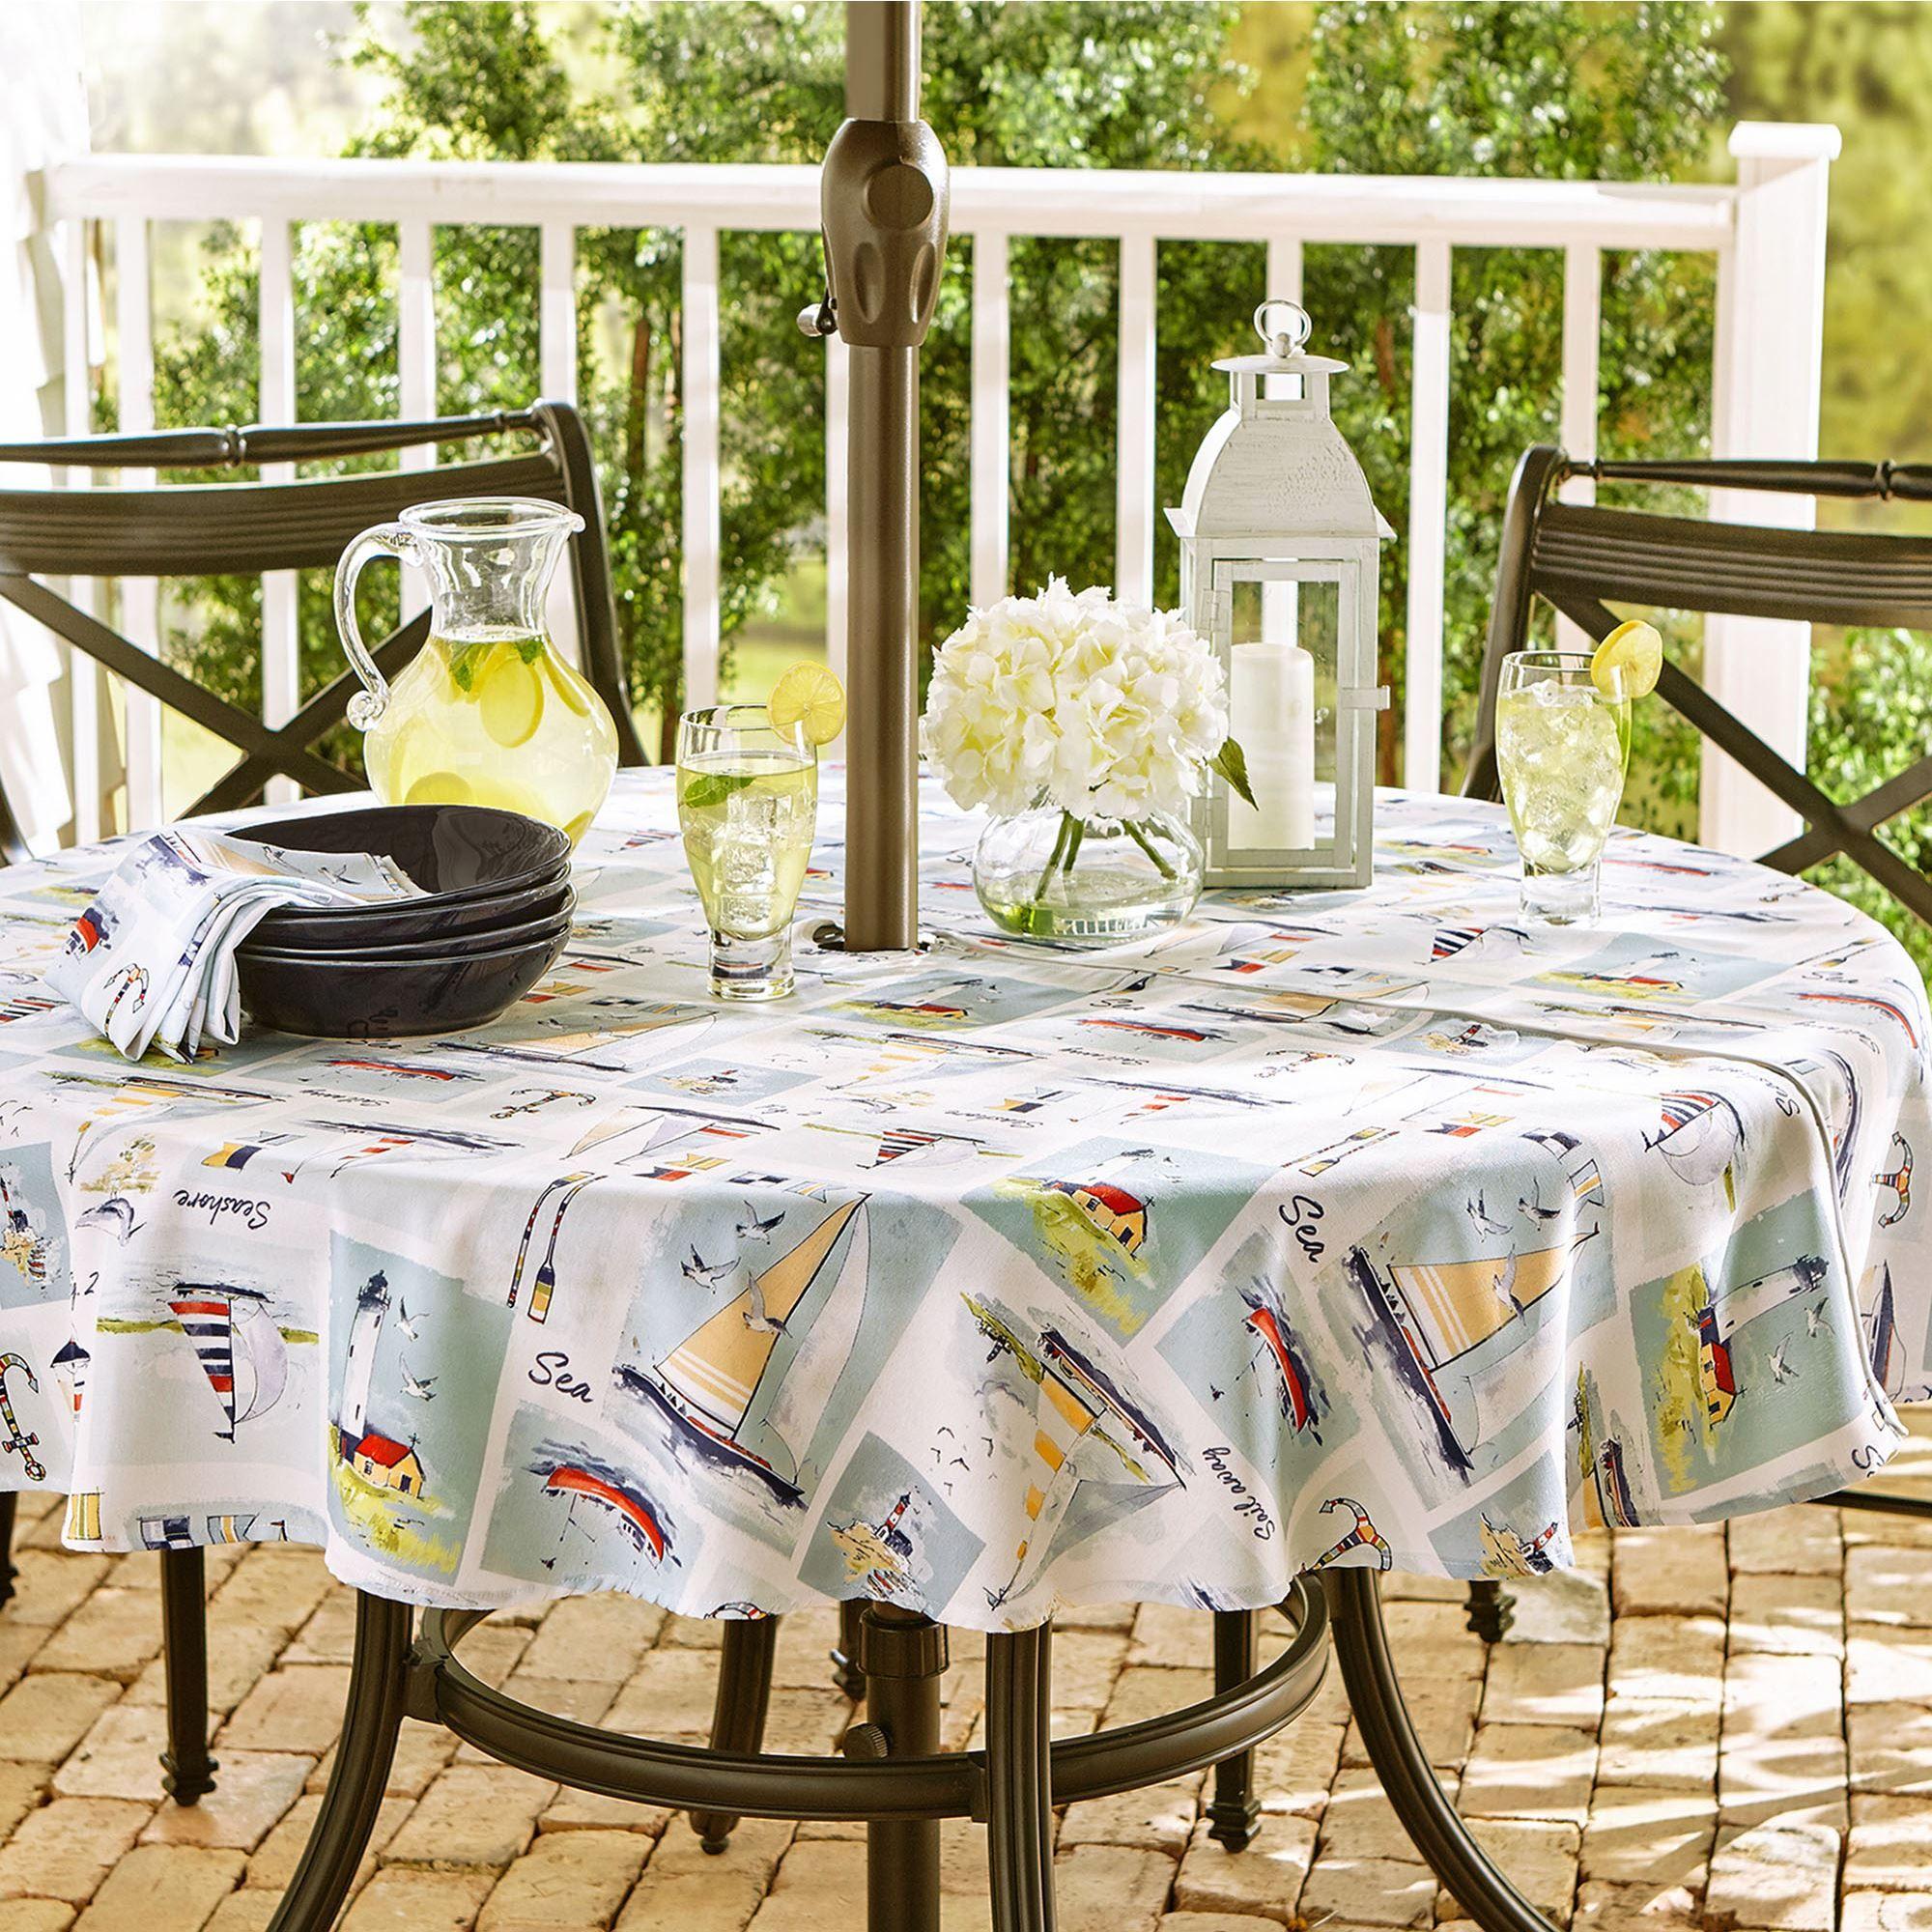 Set Sail Nautical Round Outdoor Tablecloth With Umbrella